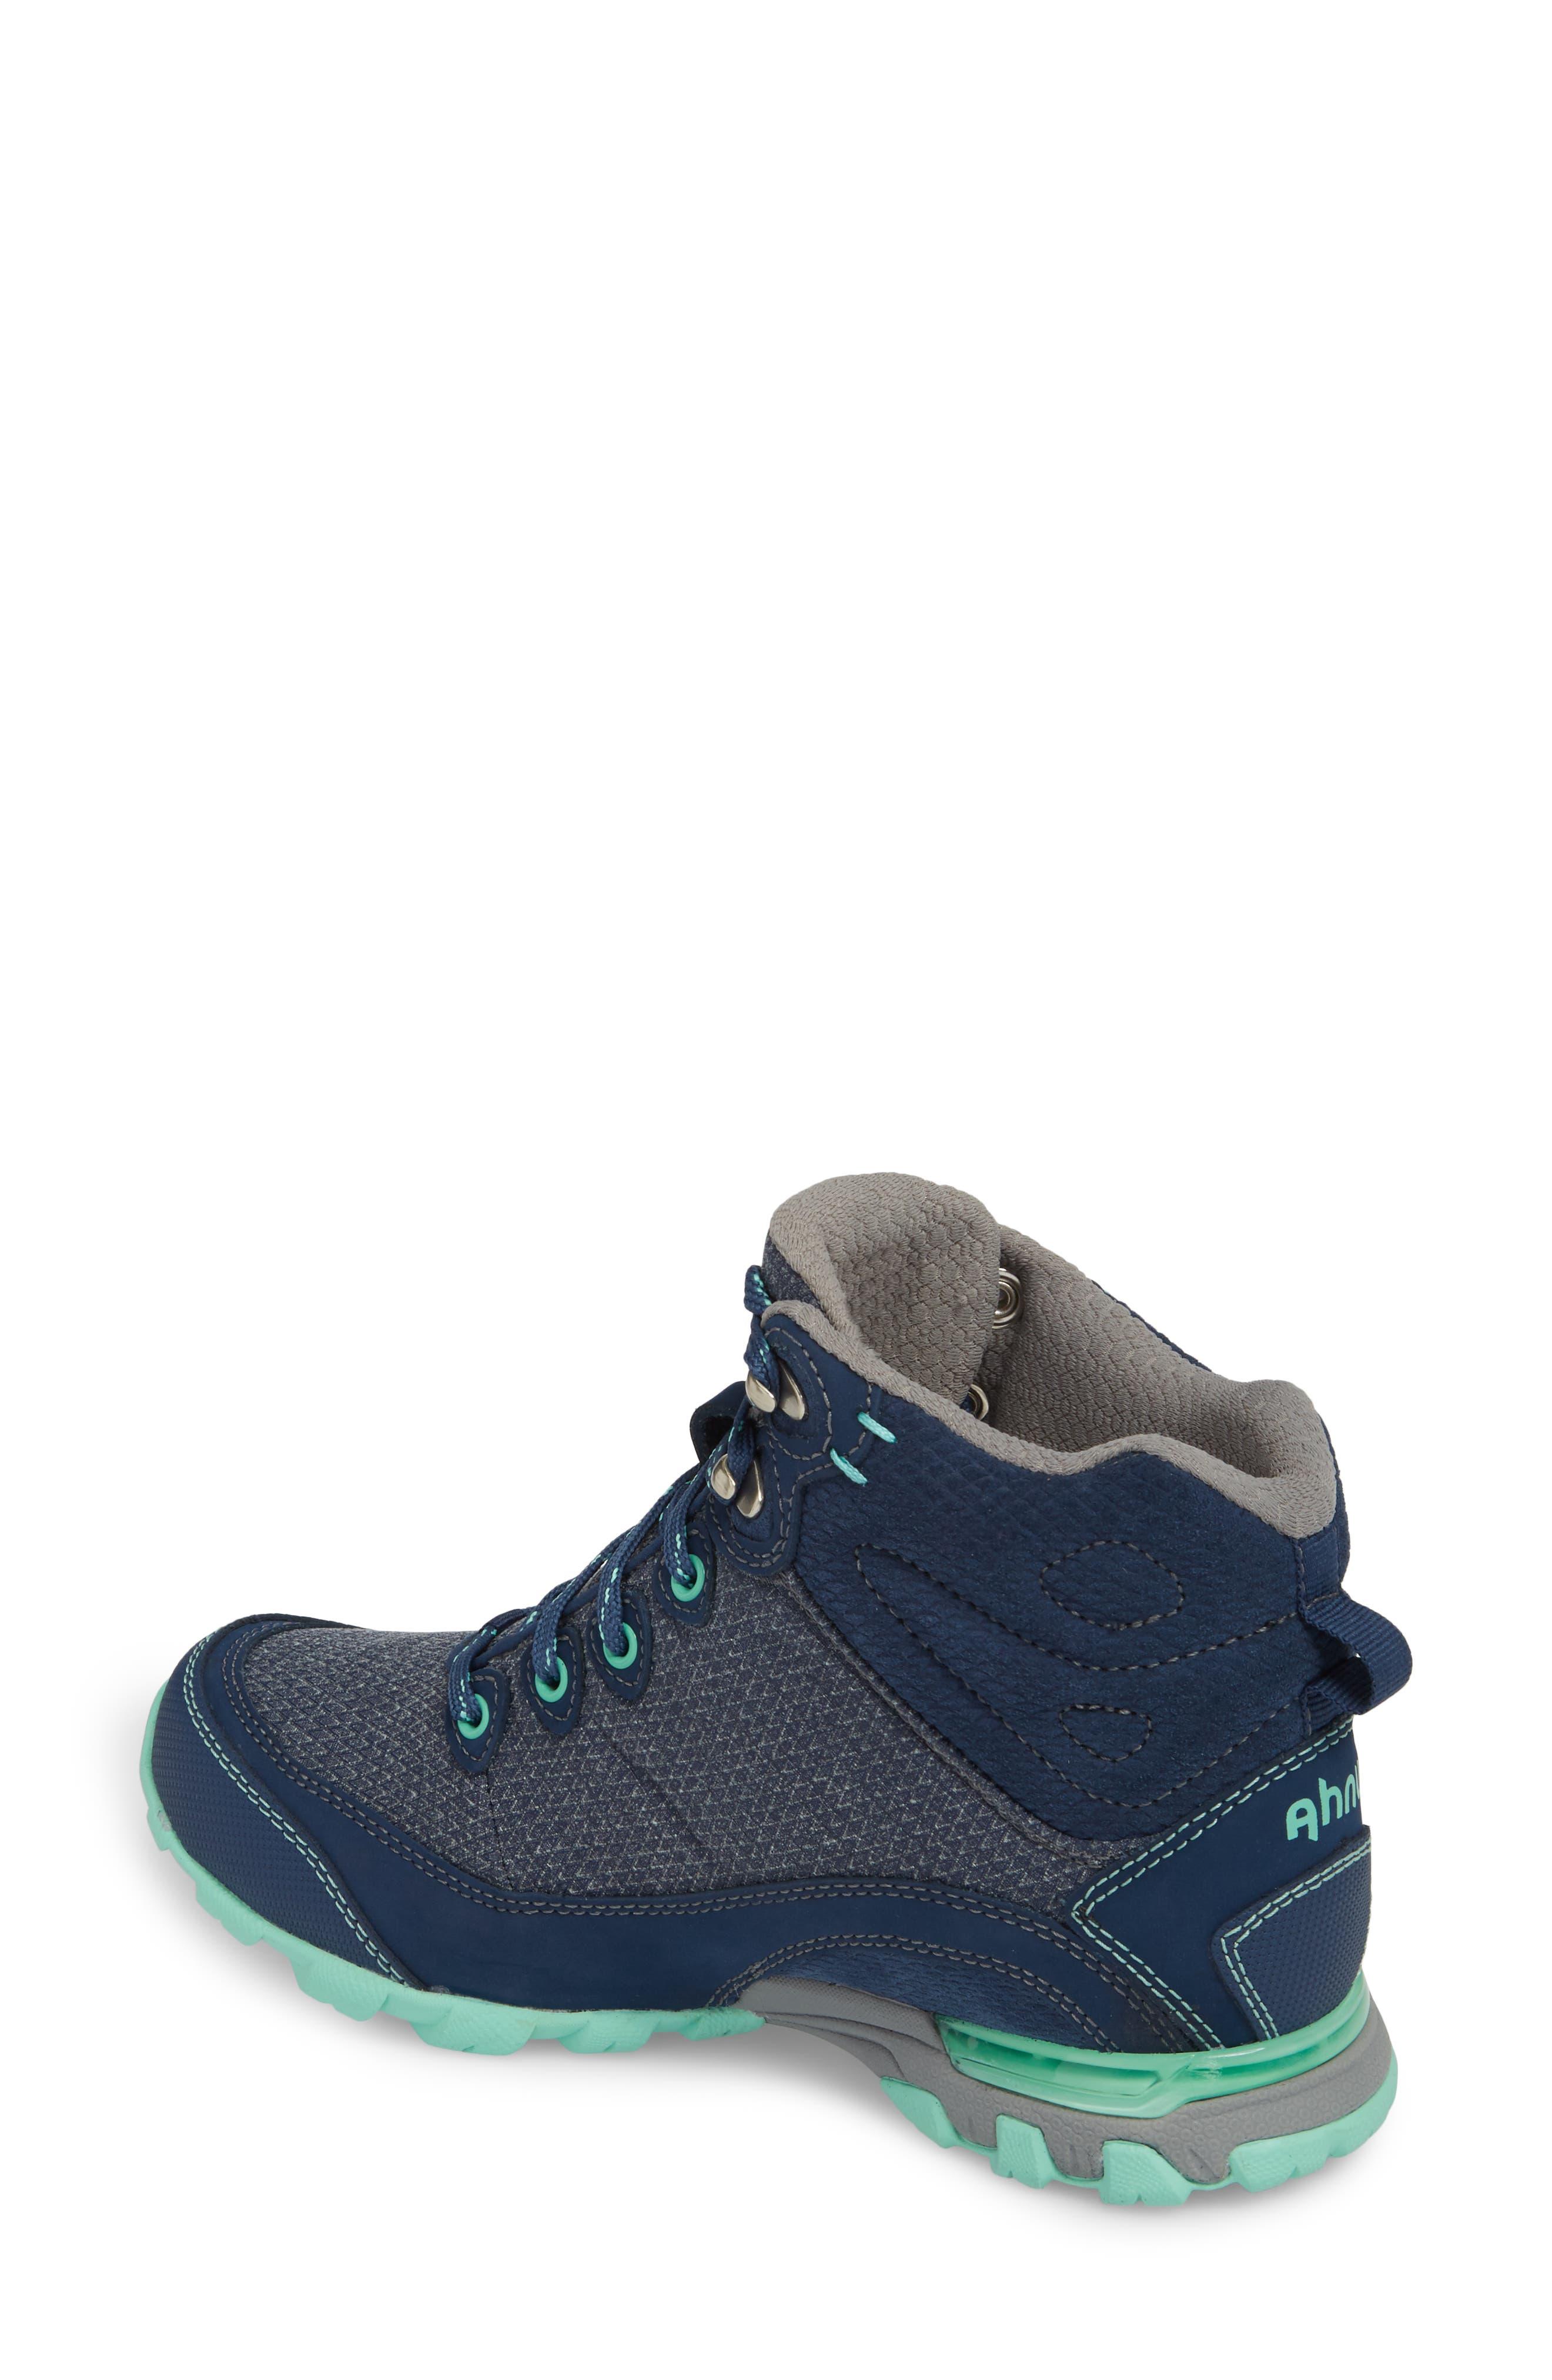 TEVA, Ahnu by Teva Sugarpine II Waterproof Hiking Boot, Alternate thumbnail 2, color, INSIGNIA BLUE